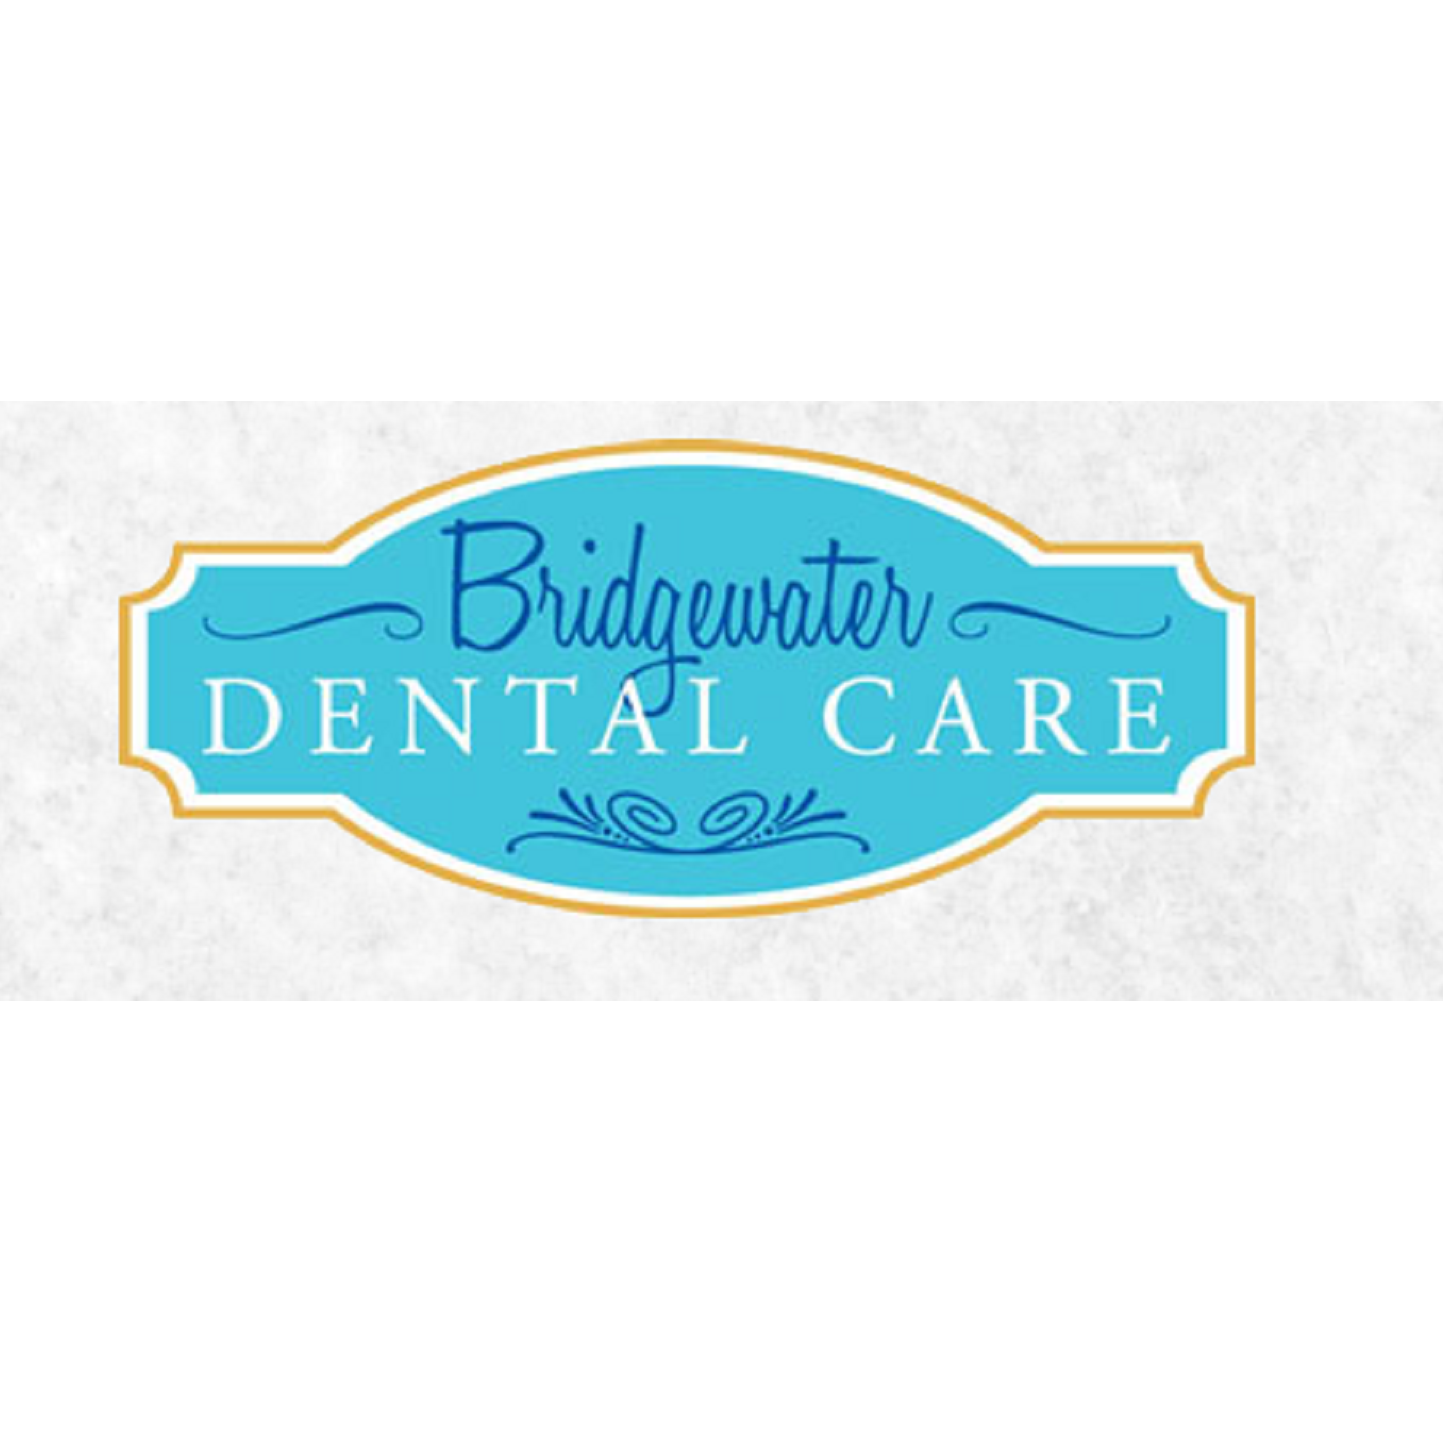 Bridgewater Dental Care